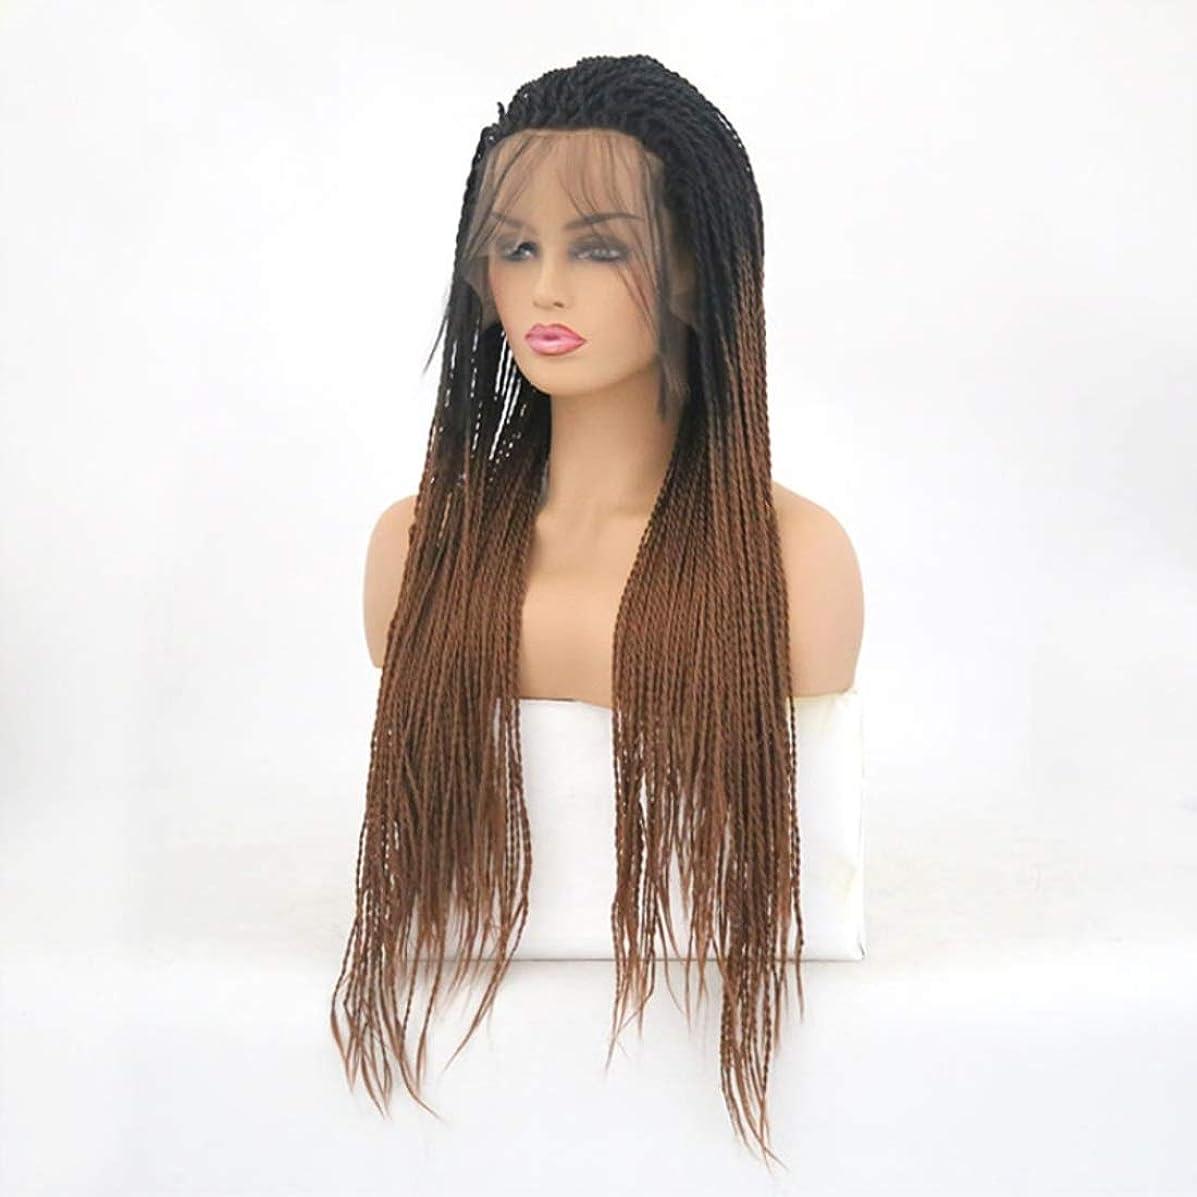 Koloeplf ツイストブレイドかぎ針編みブレイドヘアエクステンション事前ループ女性用高温繊維